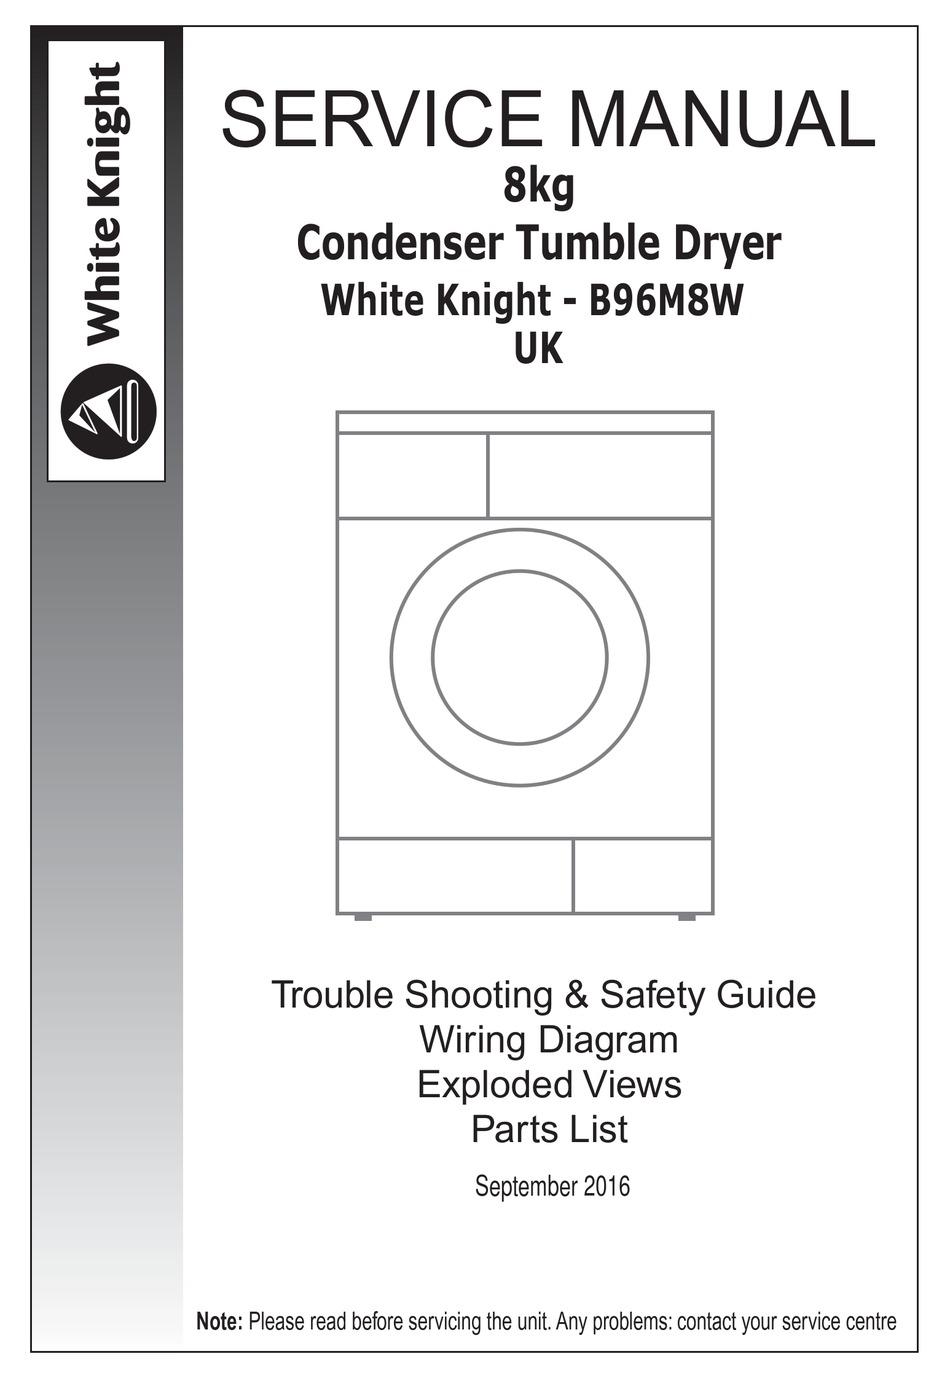 WHITE KNIGHT B96M8W SERVICE MANUAL Pdf Download | ManualsLib | White Knight Tumble Dryer Wiring Diagram |  | ManualsLib